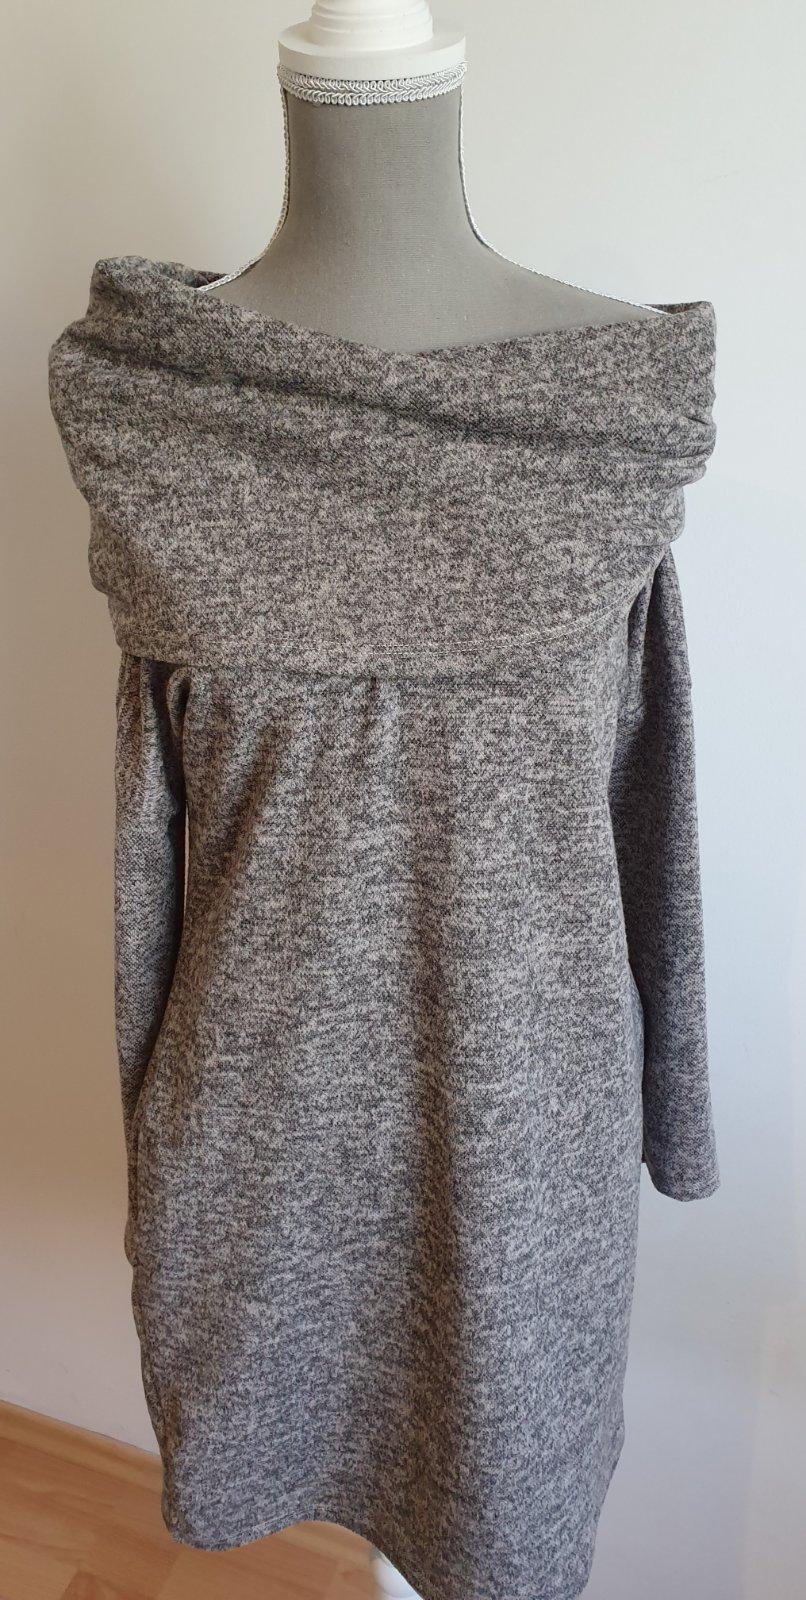 jemné šaty - Obrázok č. 1